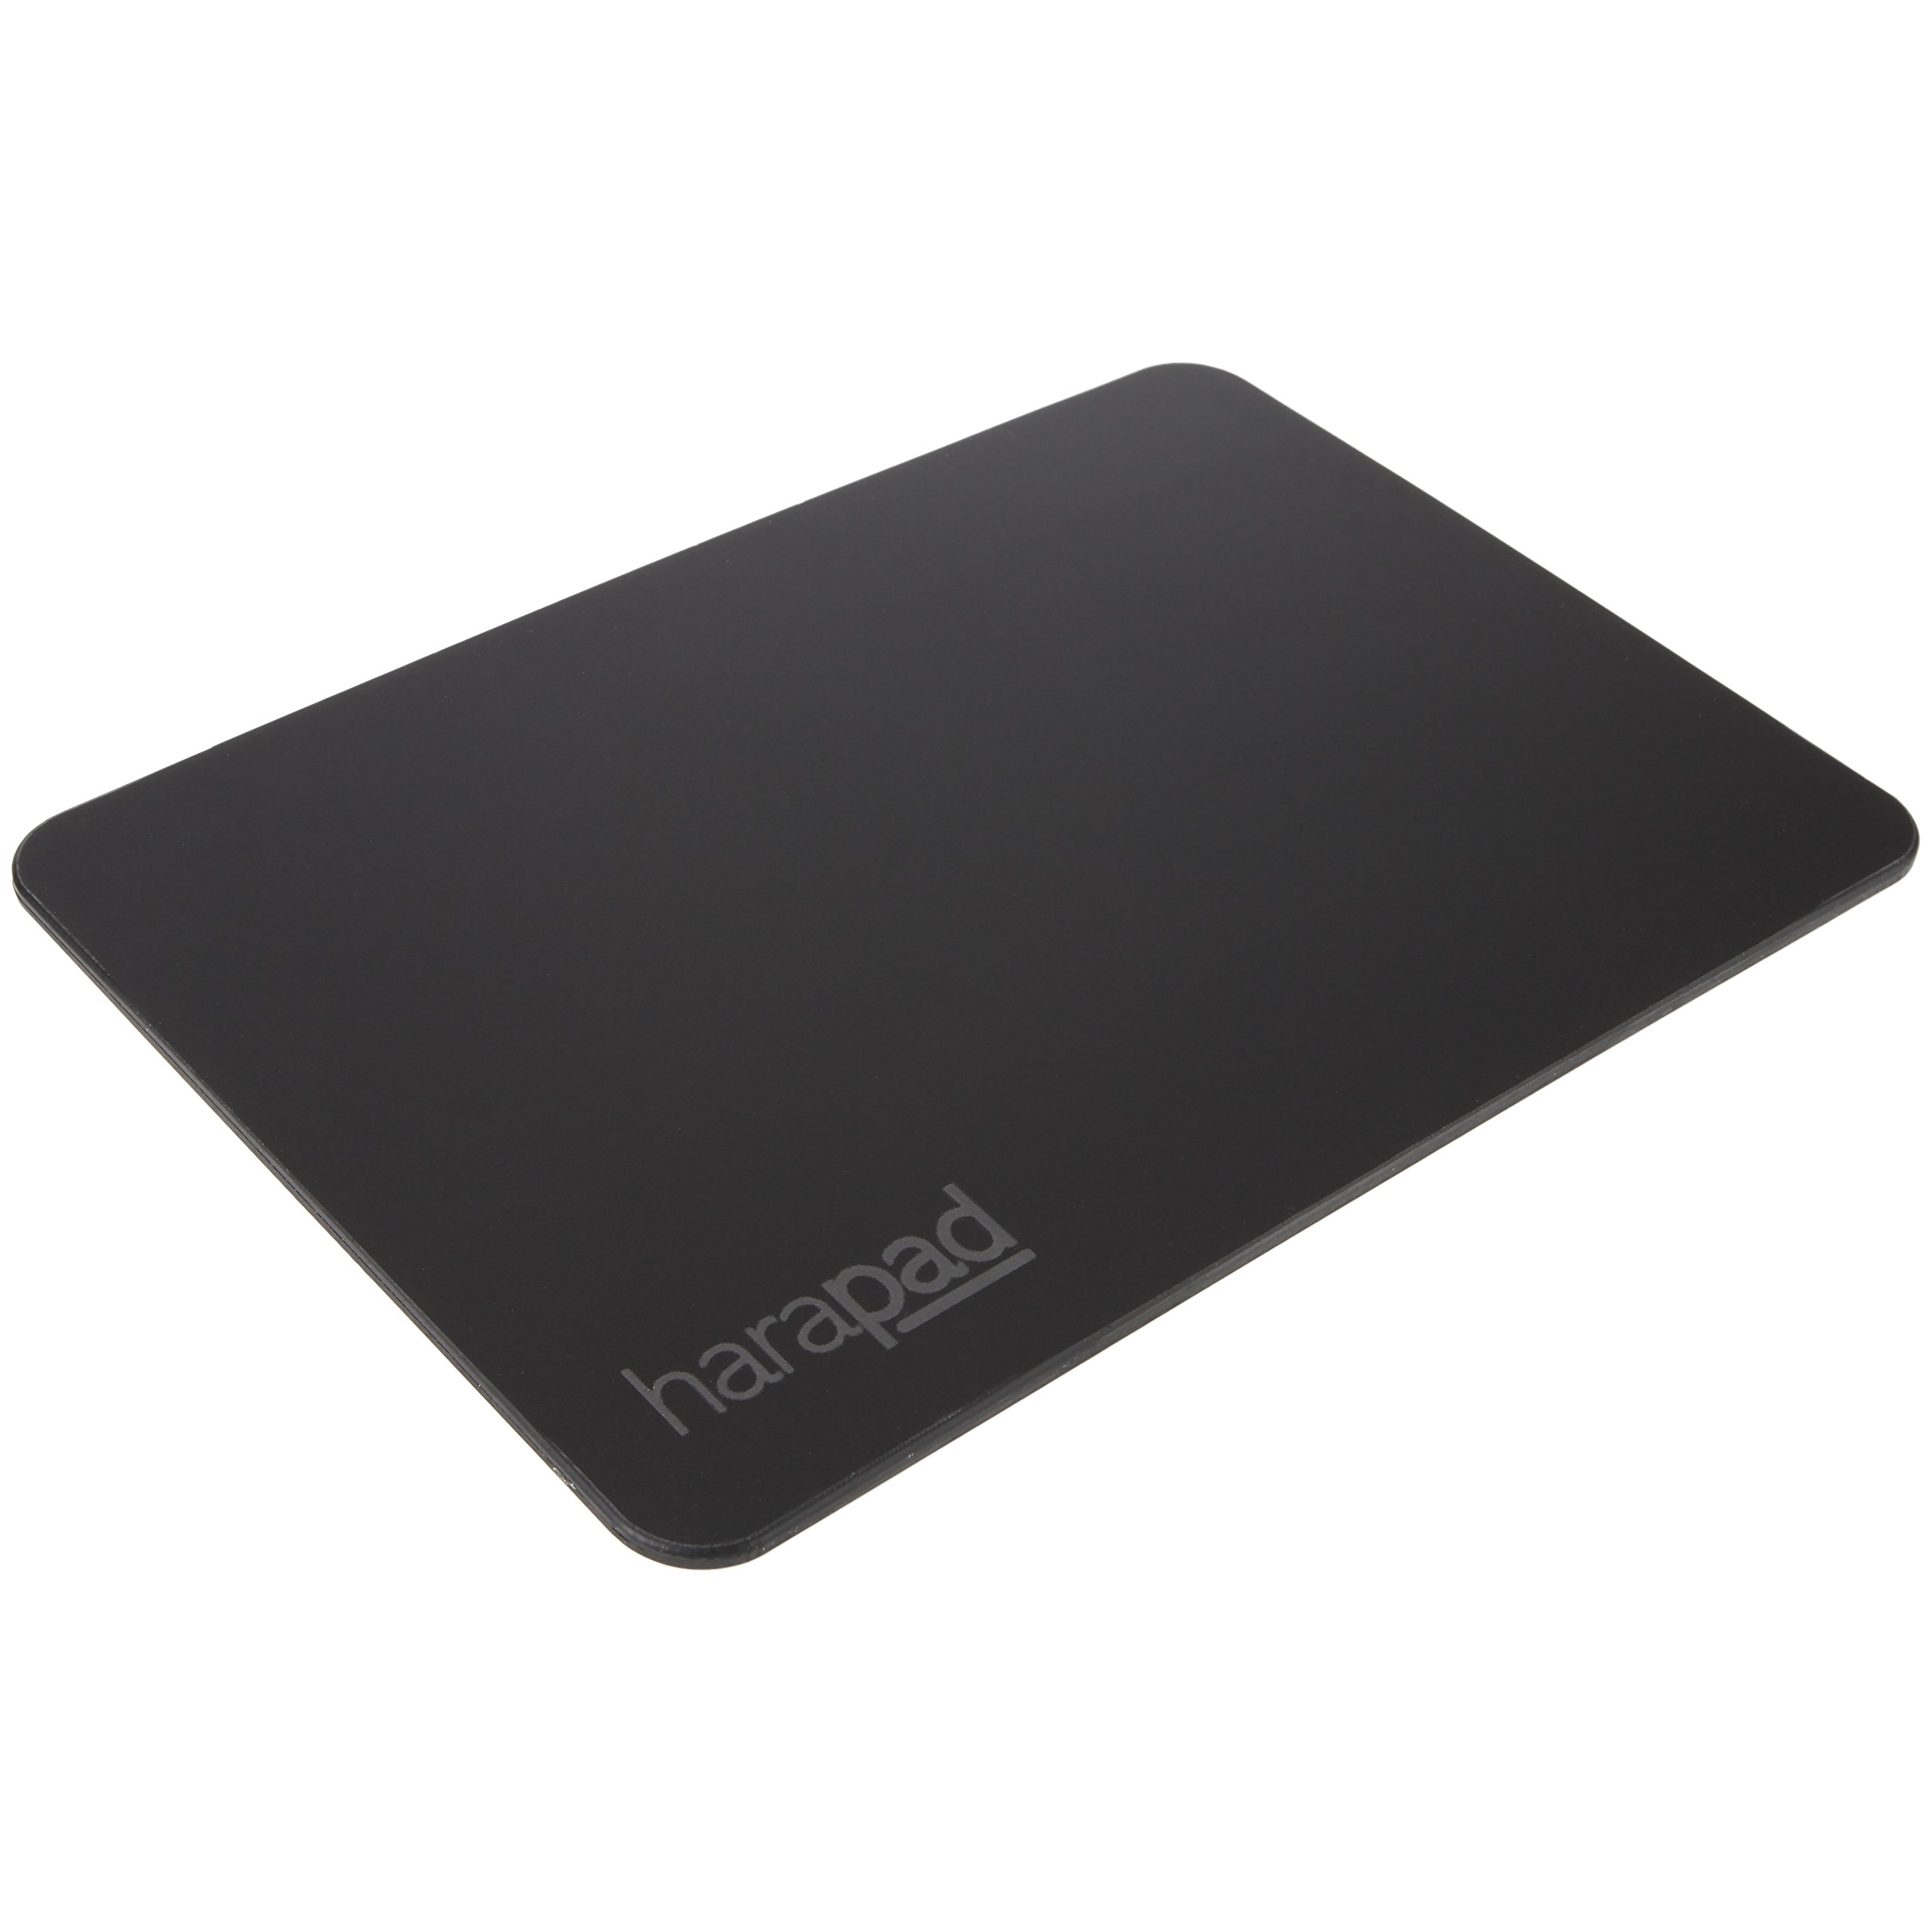 "Laptop EMF Pad Providing EMF and Radiation Protection. Black For 17"" Laptops by HARApad"